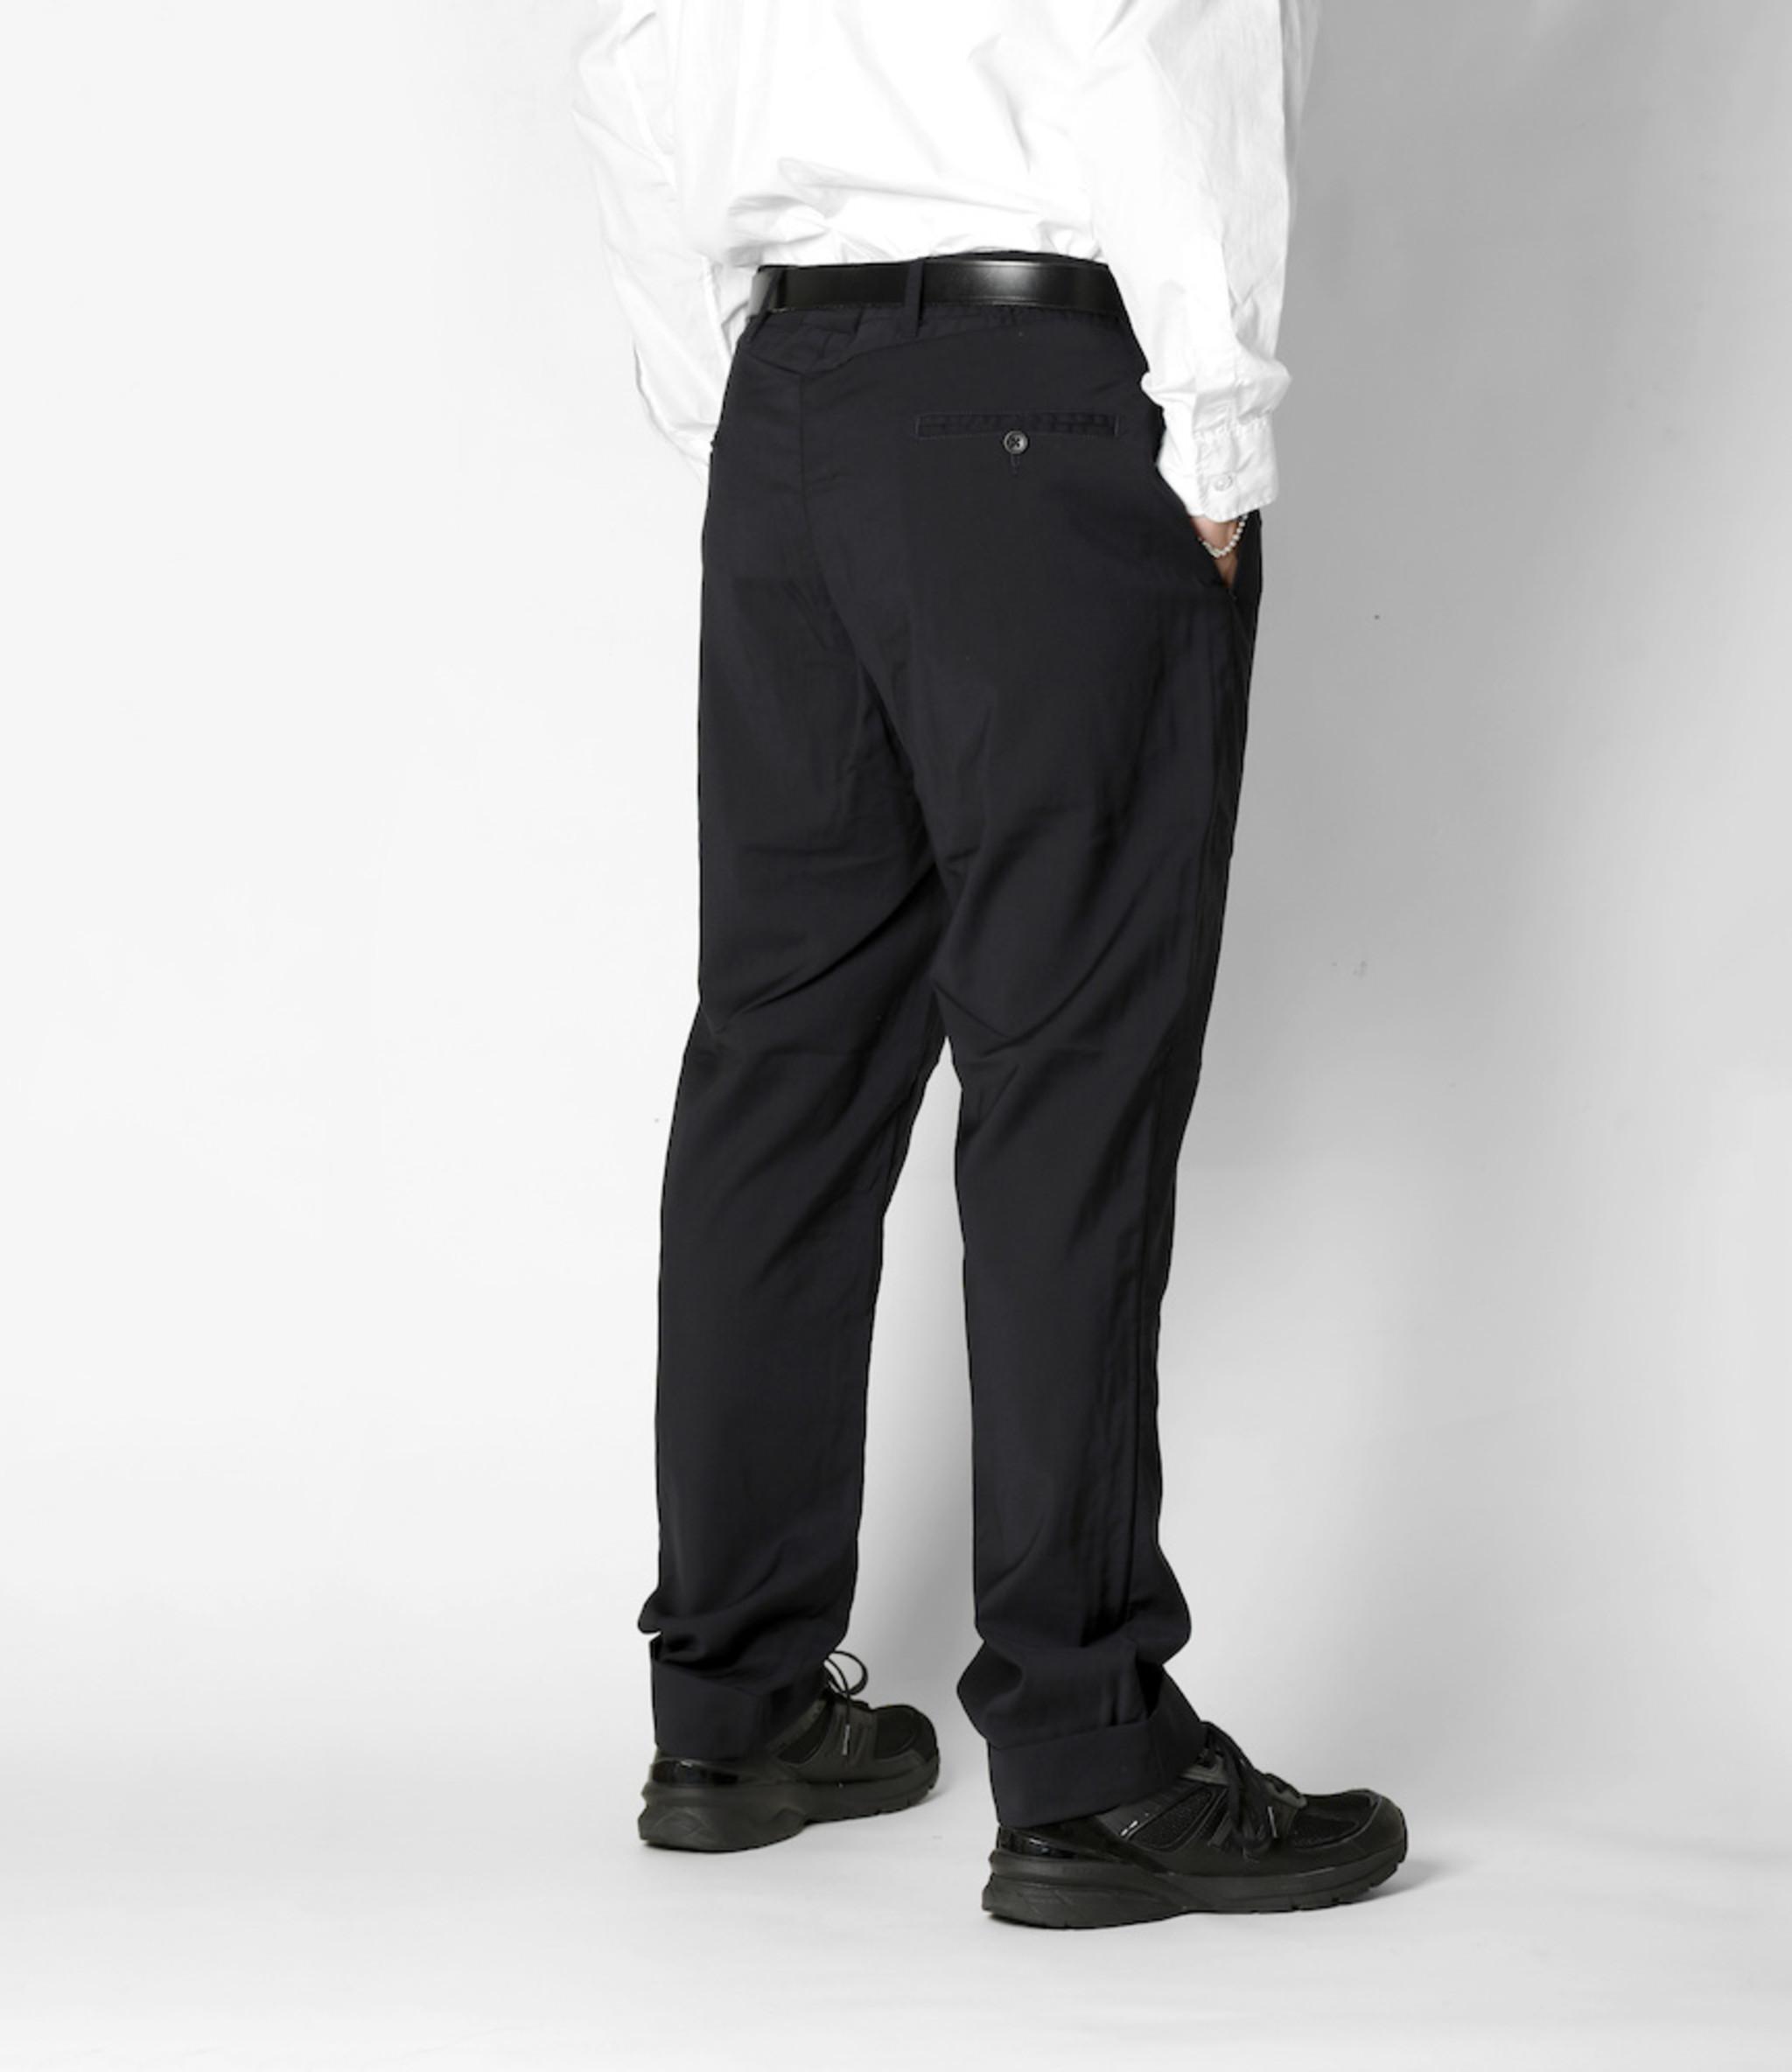 Engineered Garments EG / Andover Pant - Dk.Navy Tropical Wool